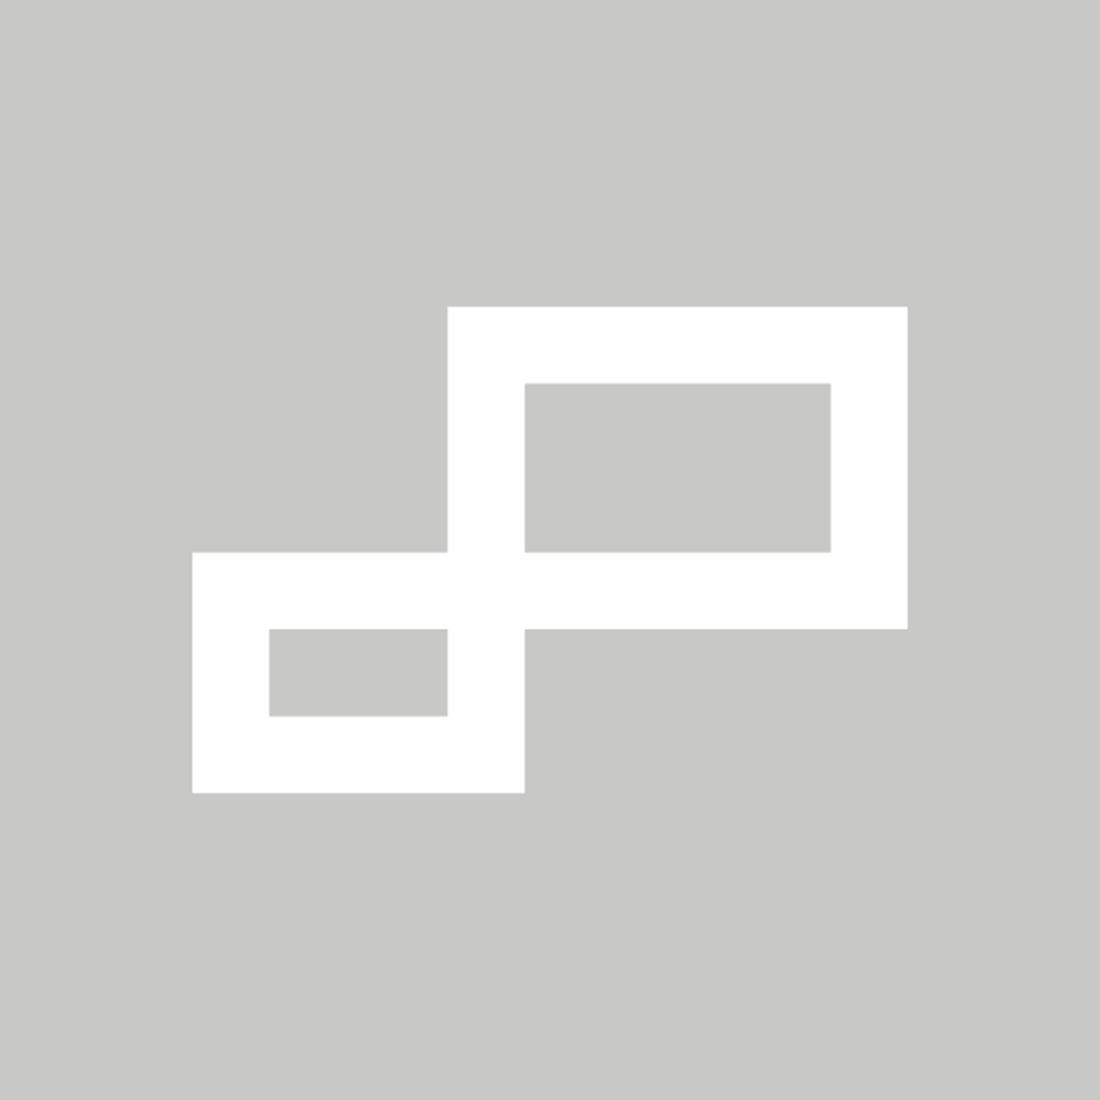 "3-3/4"" x 5-1/2"" On-Site Registration Event Badge"